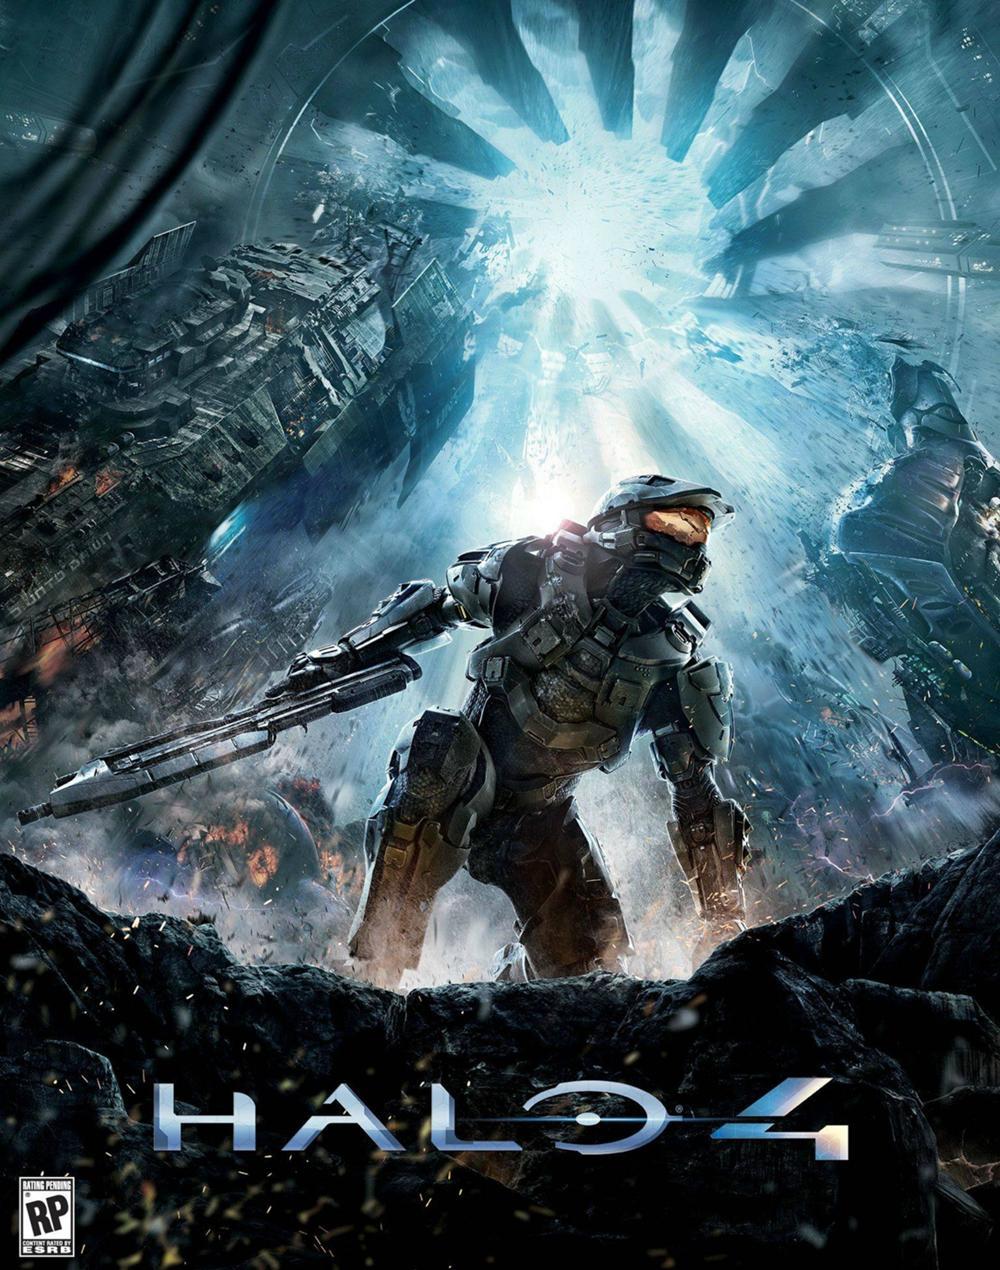 1000px-Halo-4-Box-Art.jpg